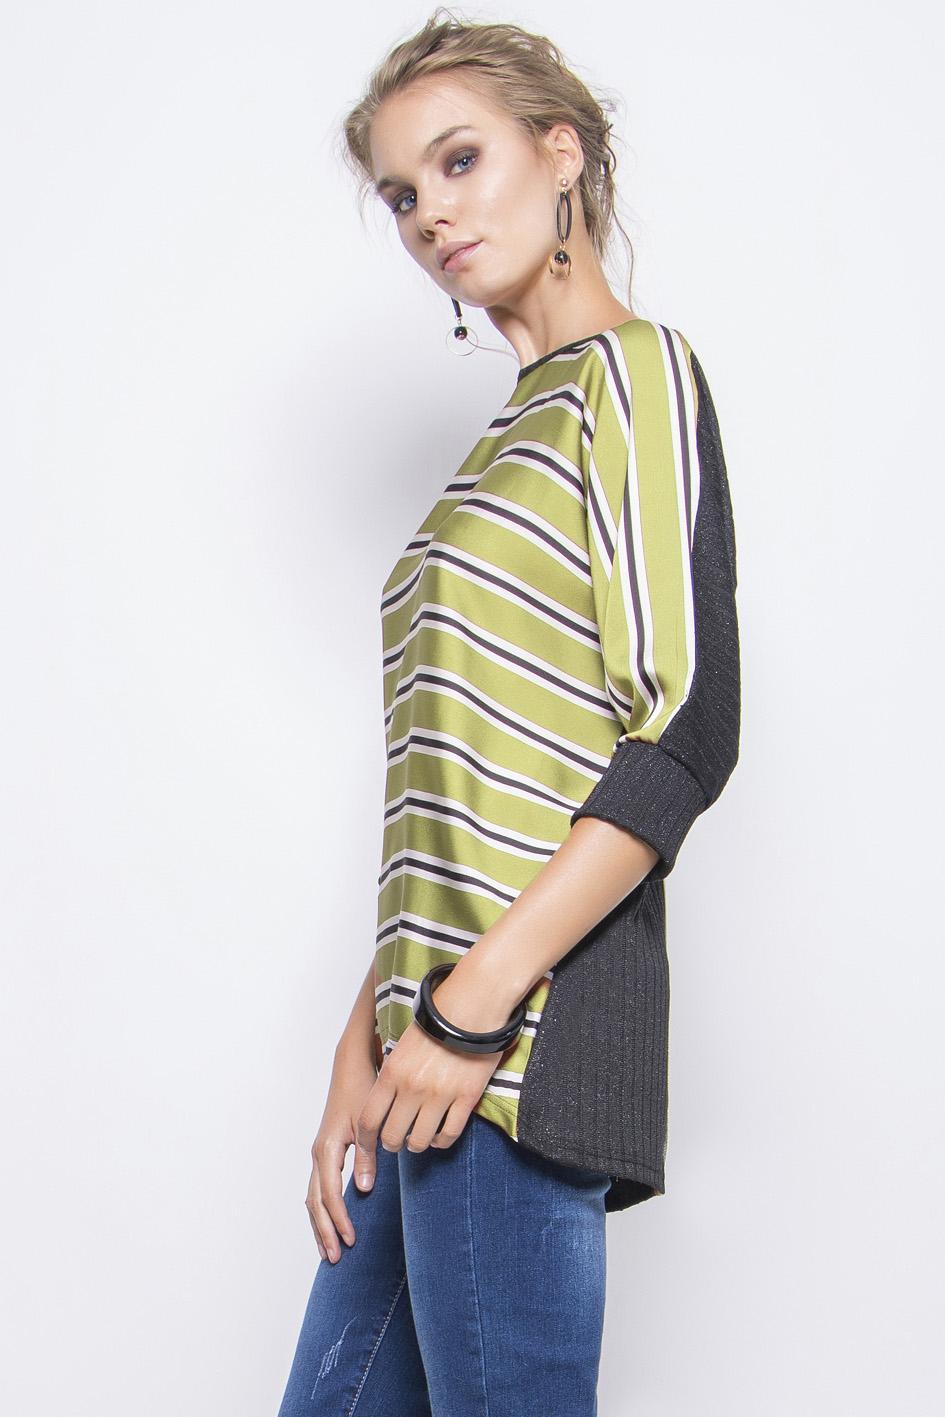 c7f706740a4e Μπλούζα ριγέ - Maxin Fashion